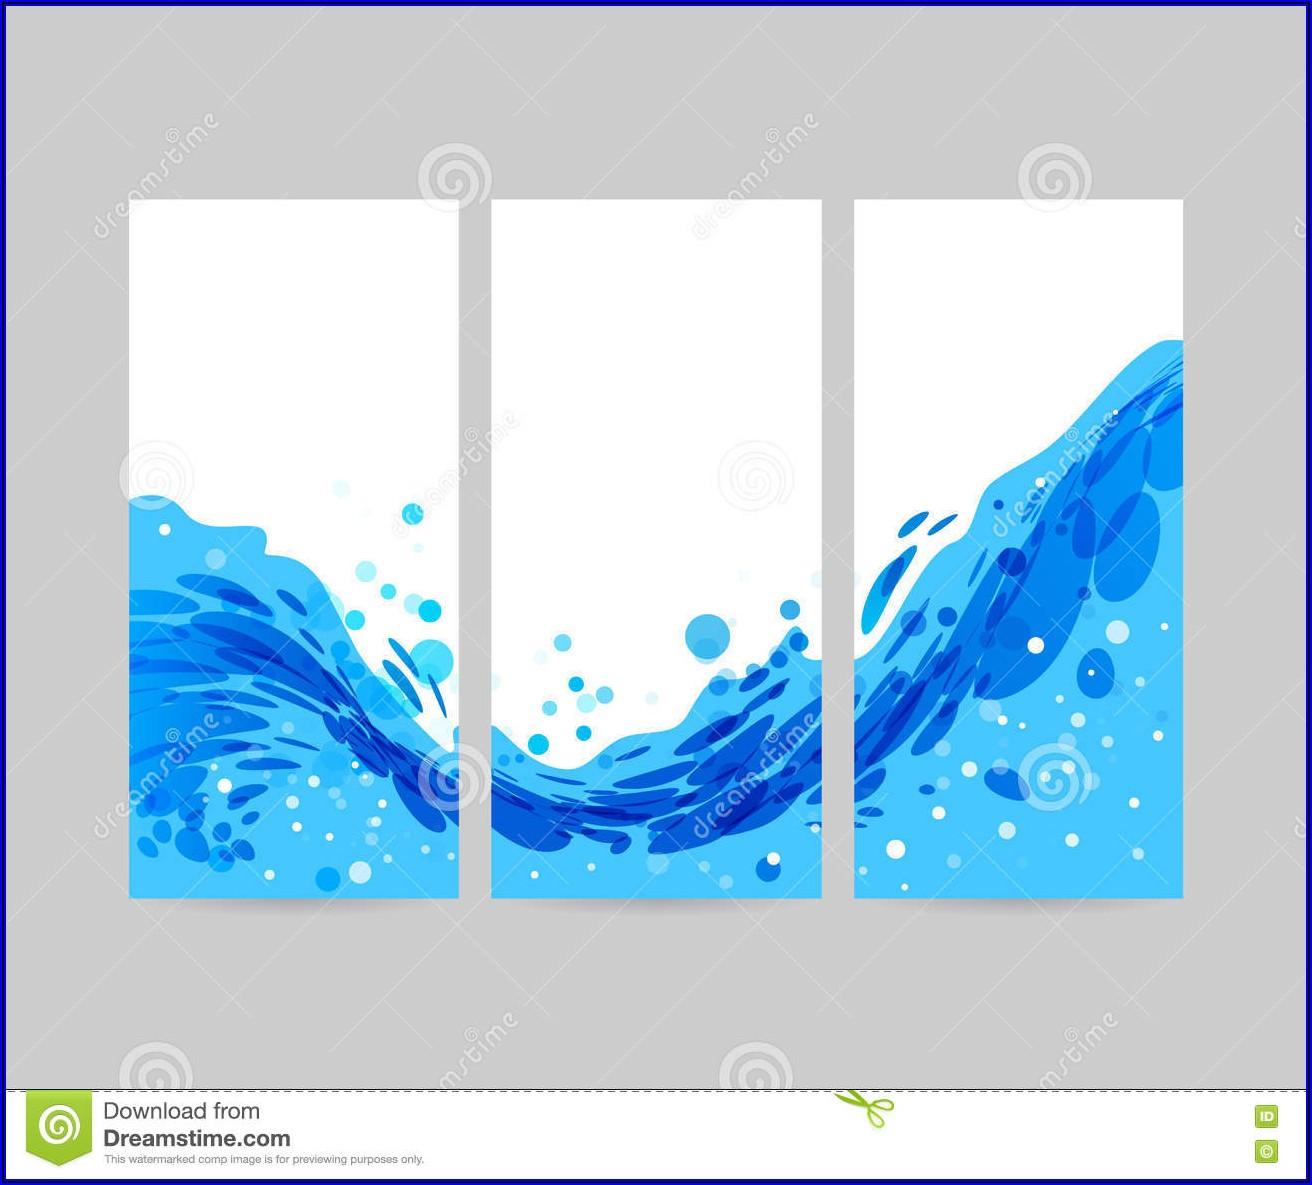 Tri Fold Brochure Background Design Vector Free Download